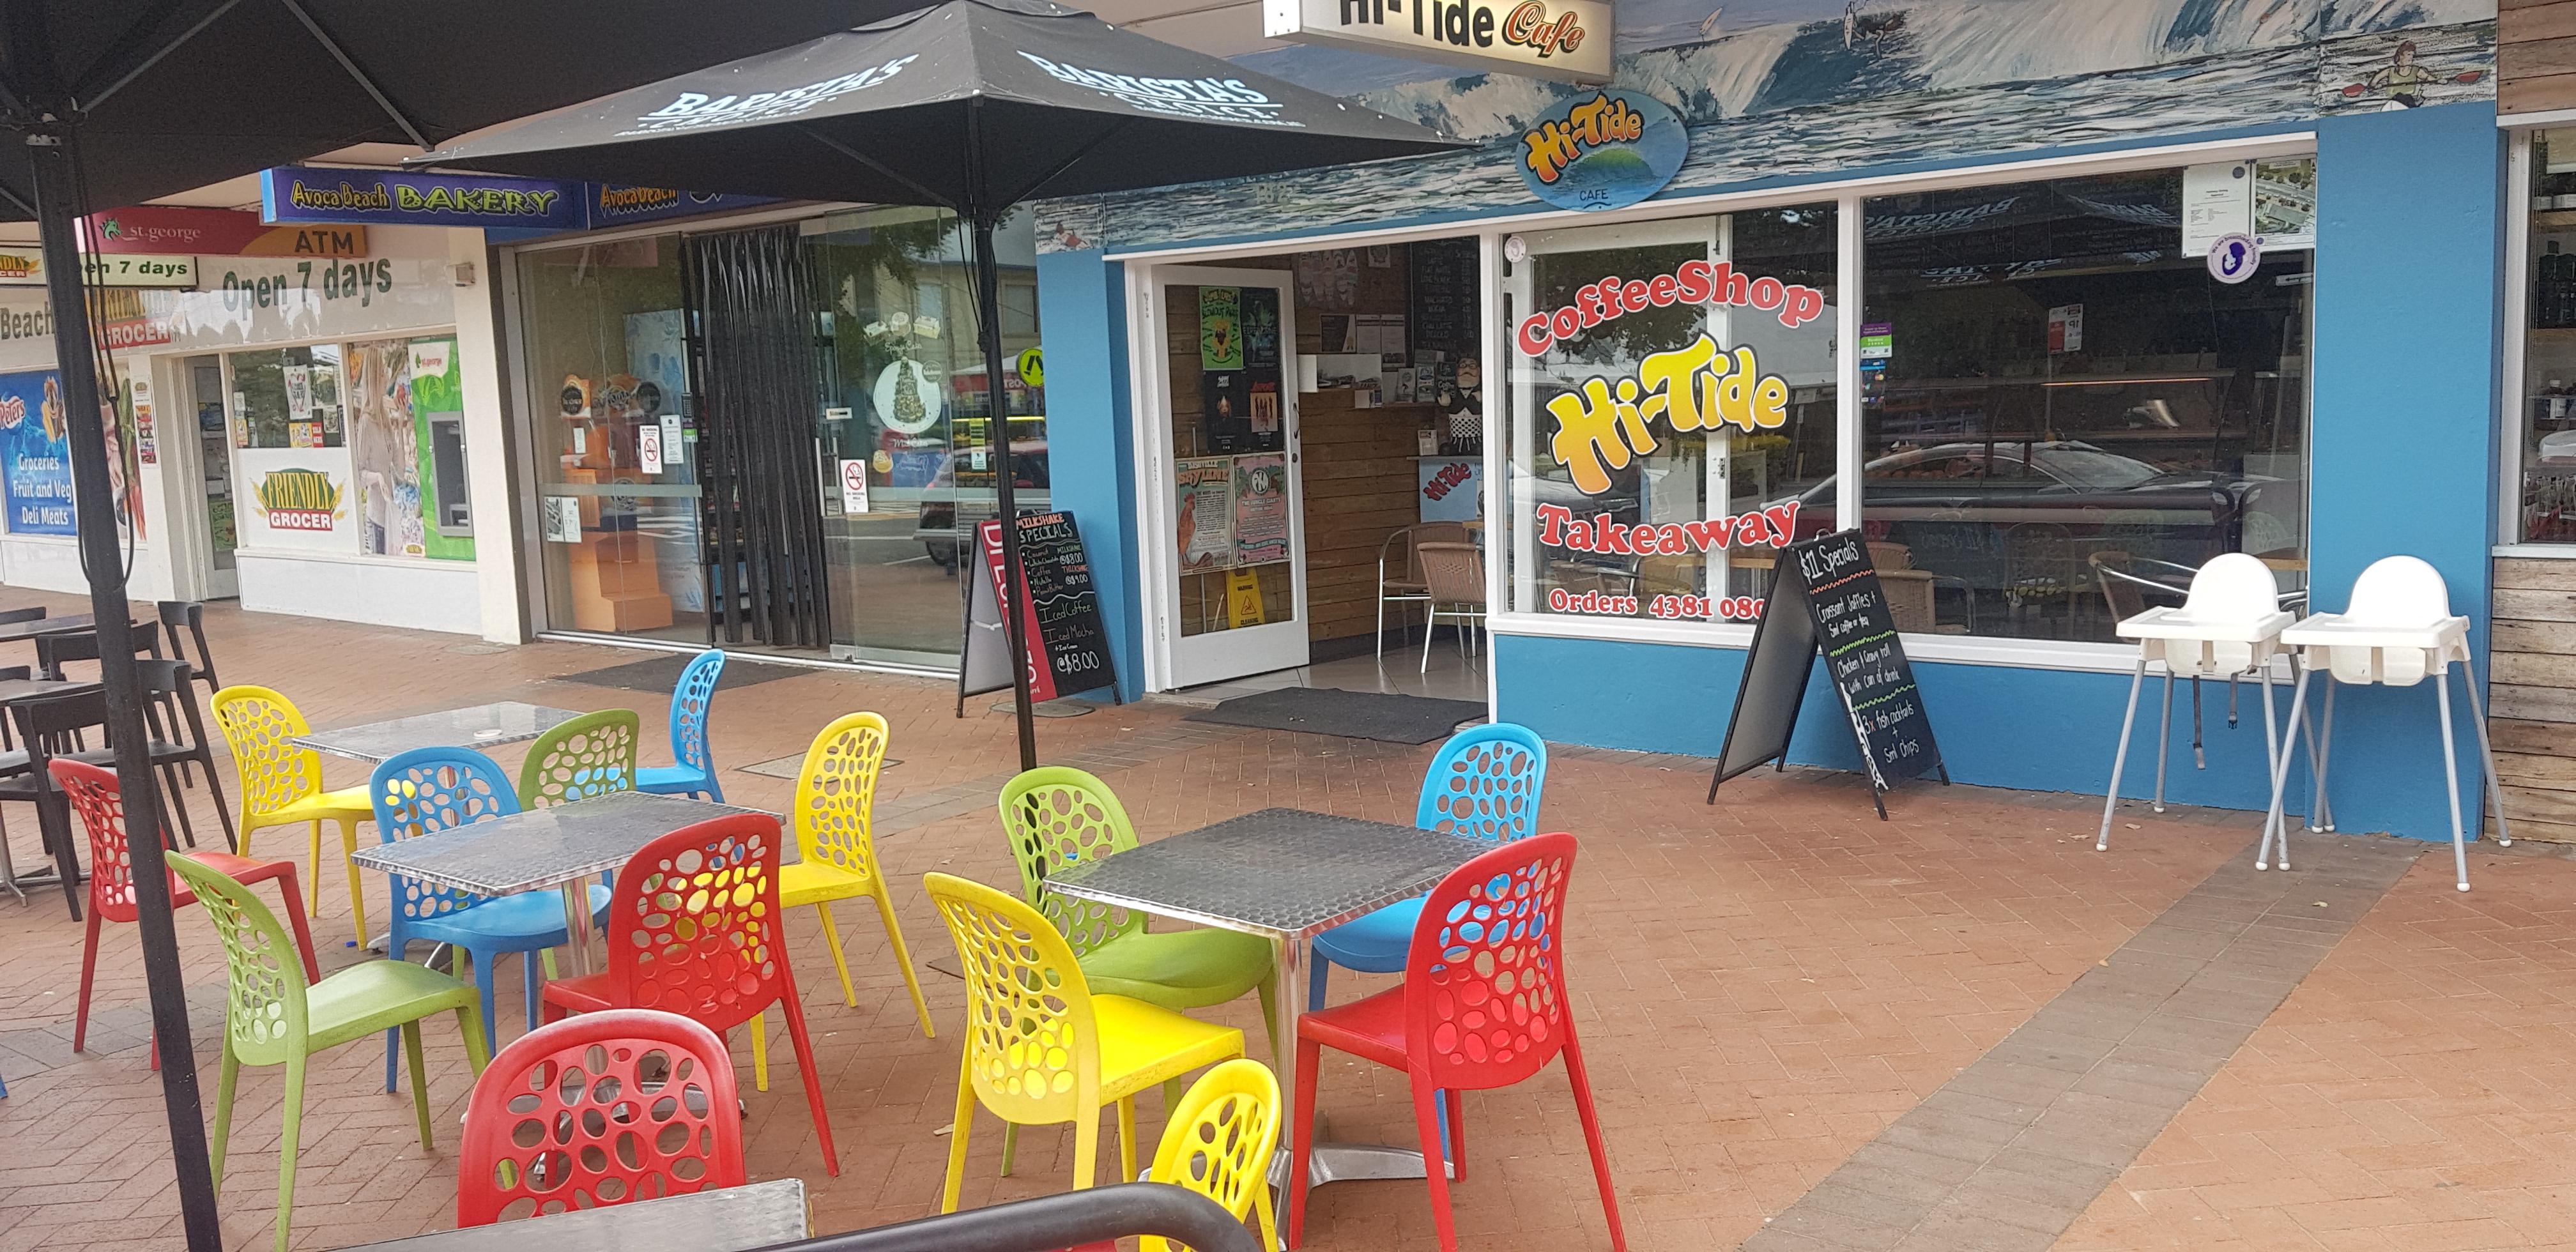 Iconic Beachside Takeaway - Avoca Beach NSW